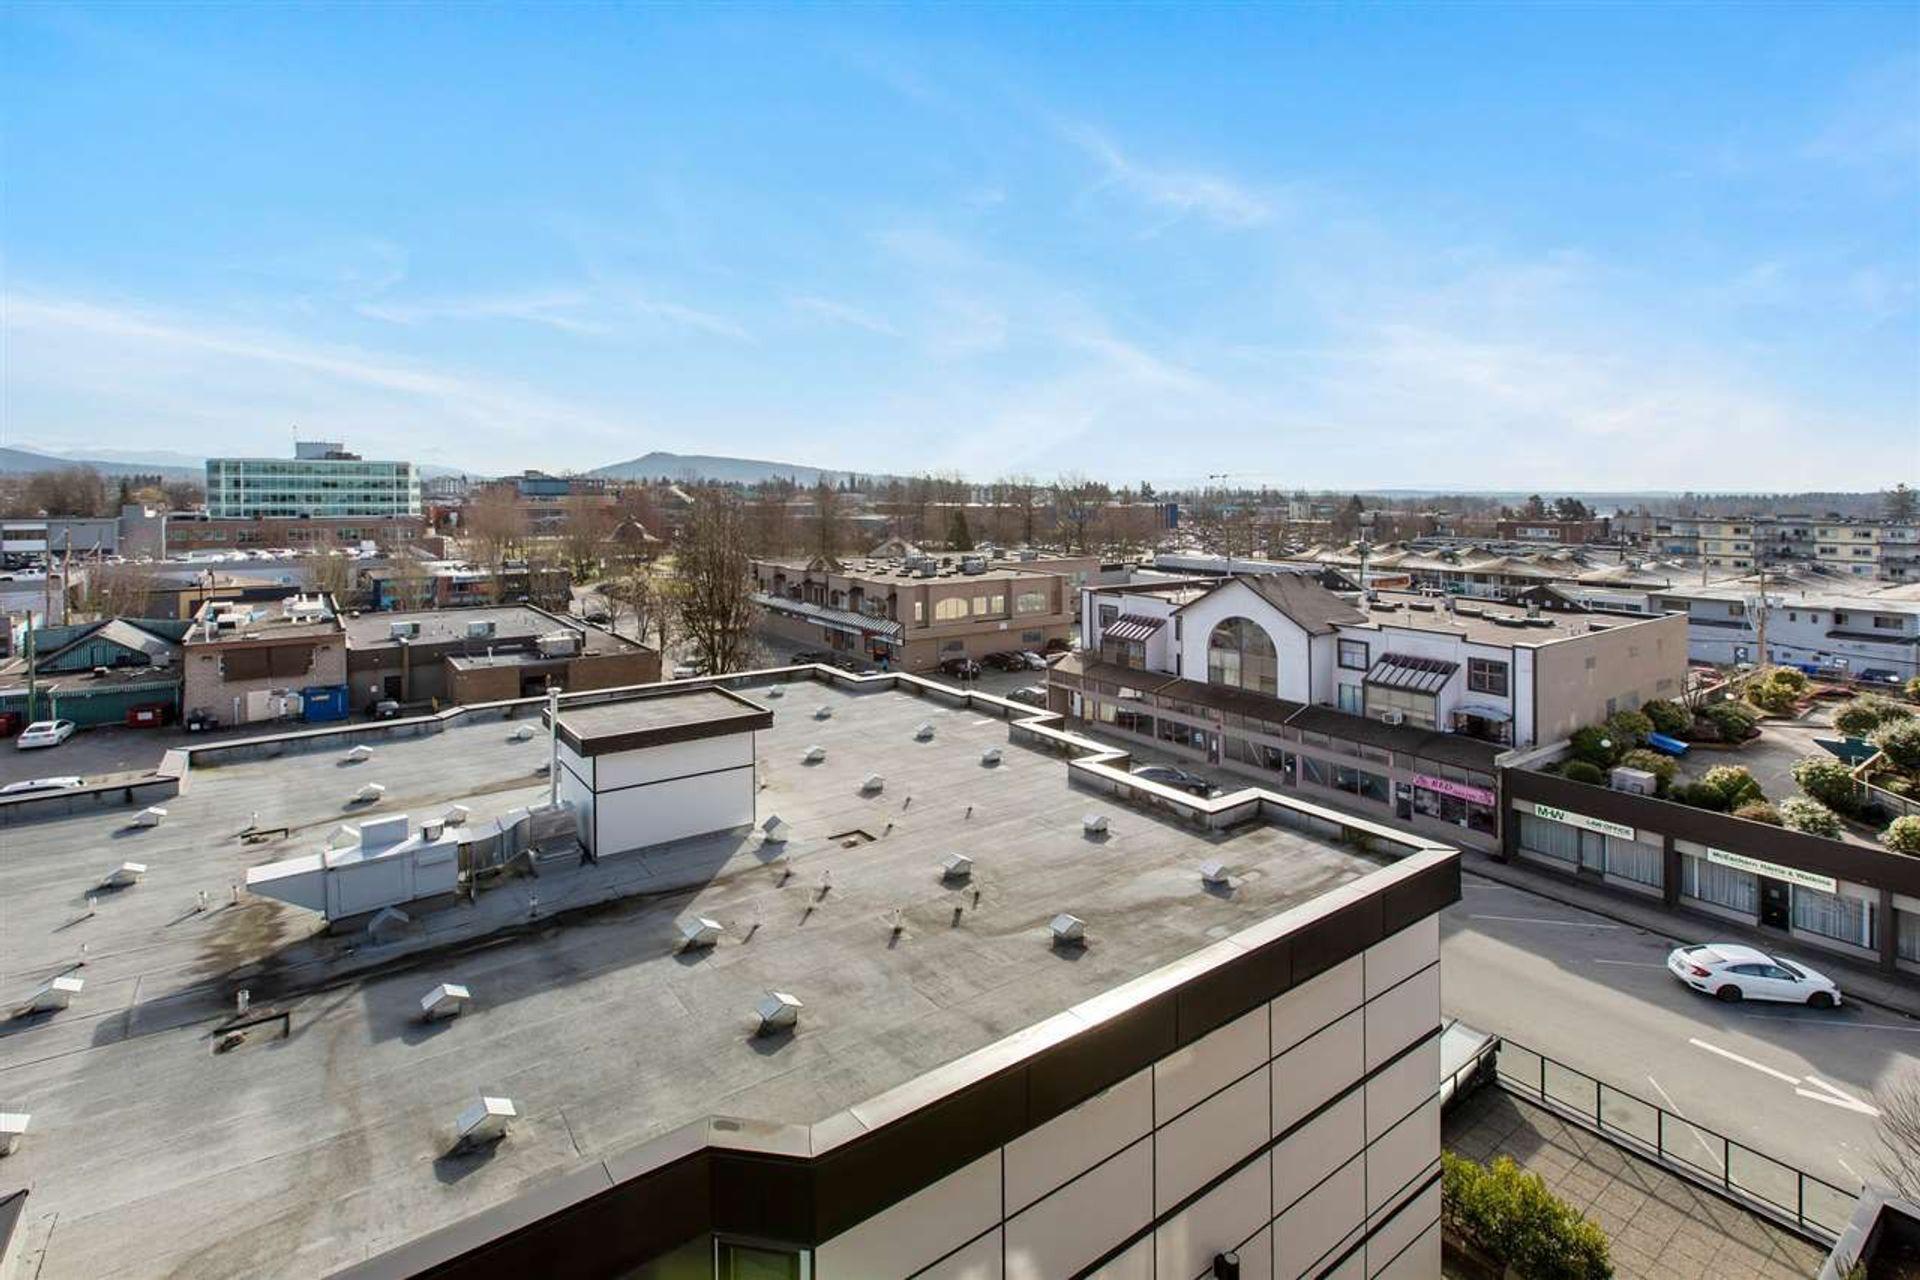 22335-mcintosh-avenue-east-central-maple-ridge-30 of 603 - 22335 Mcintosh Avenue, East Central, Maple Ridge